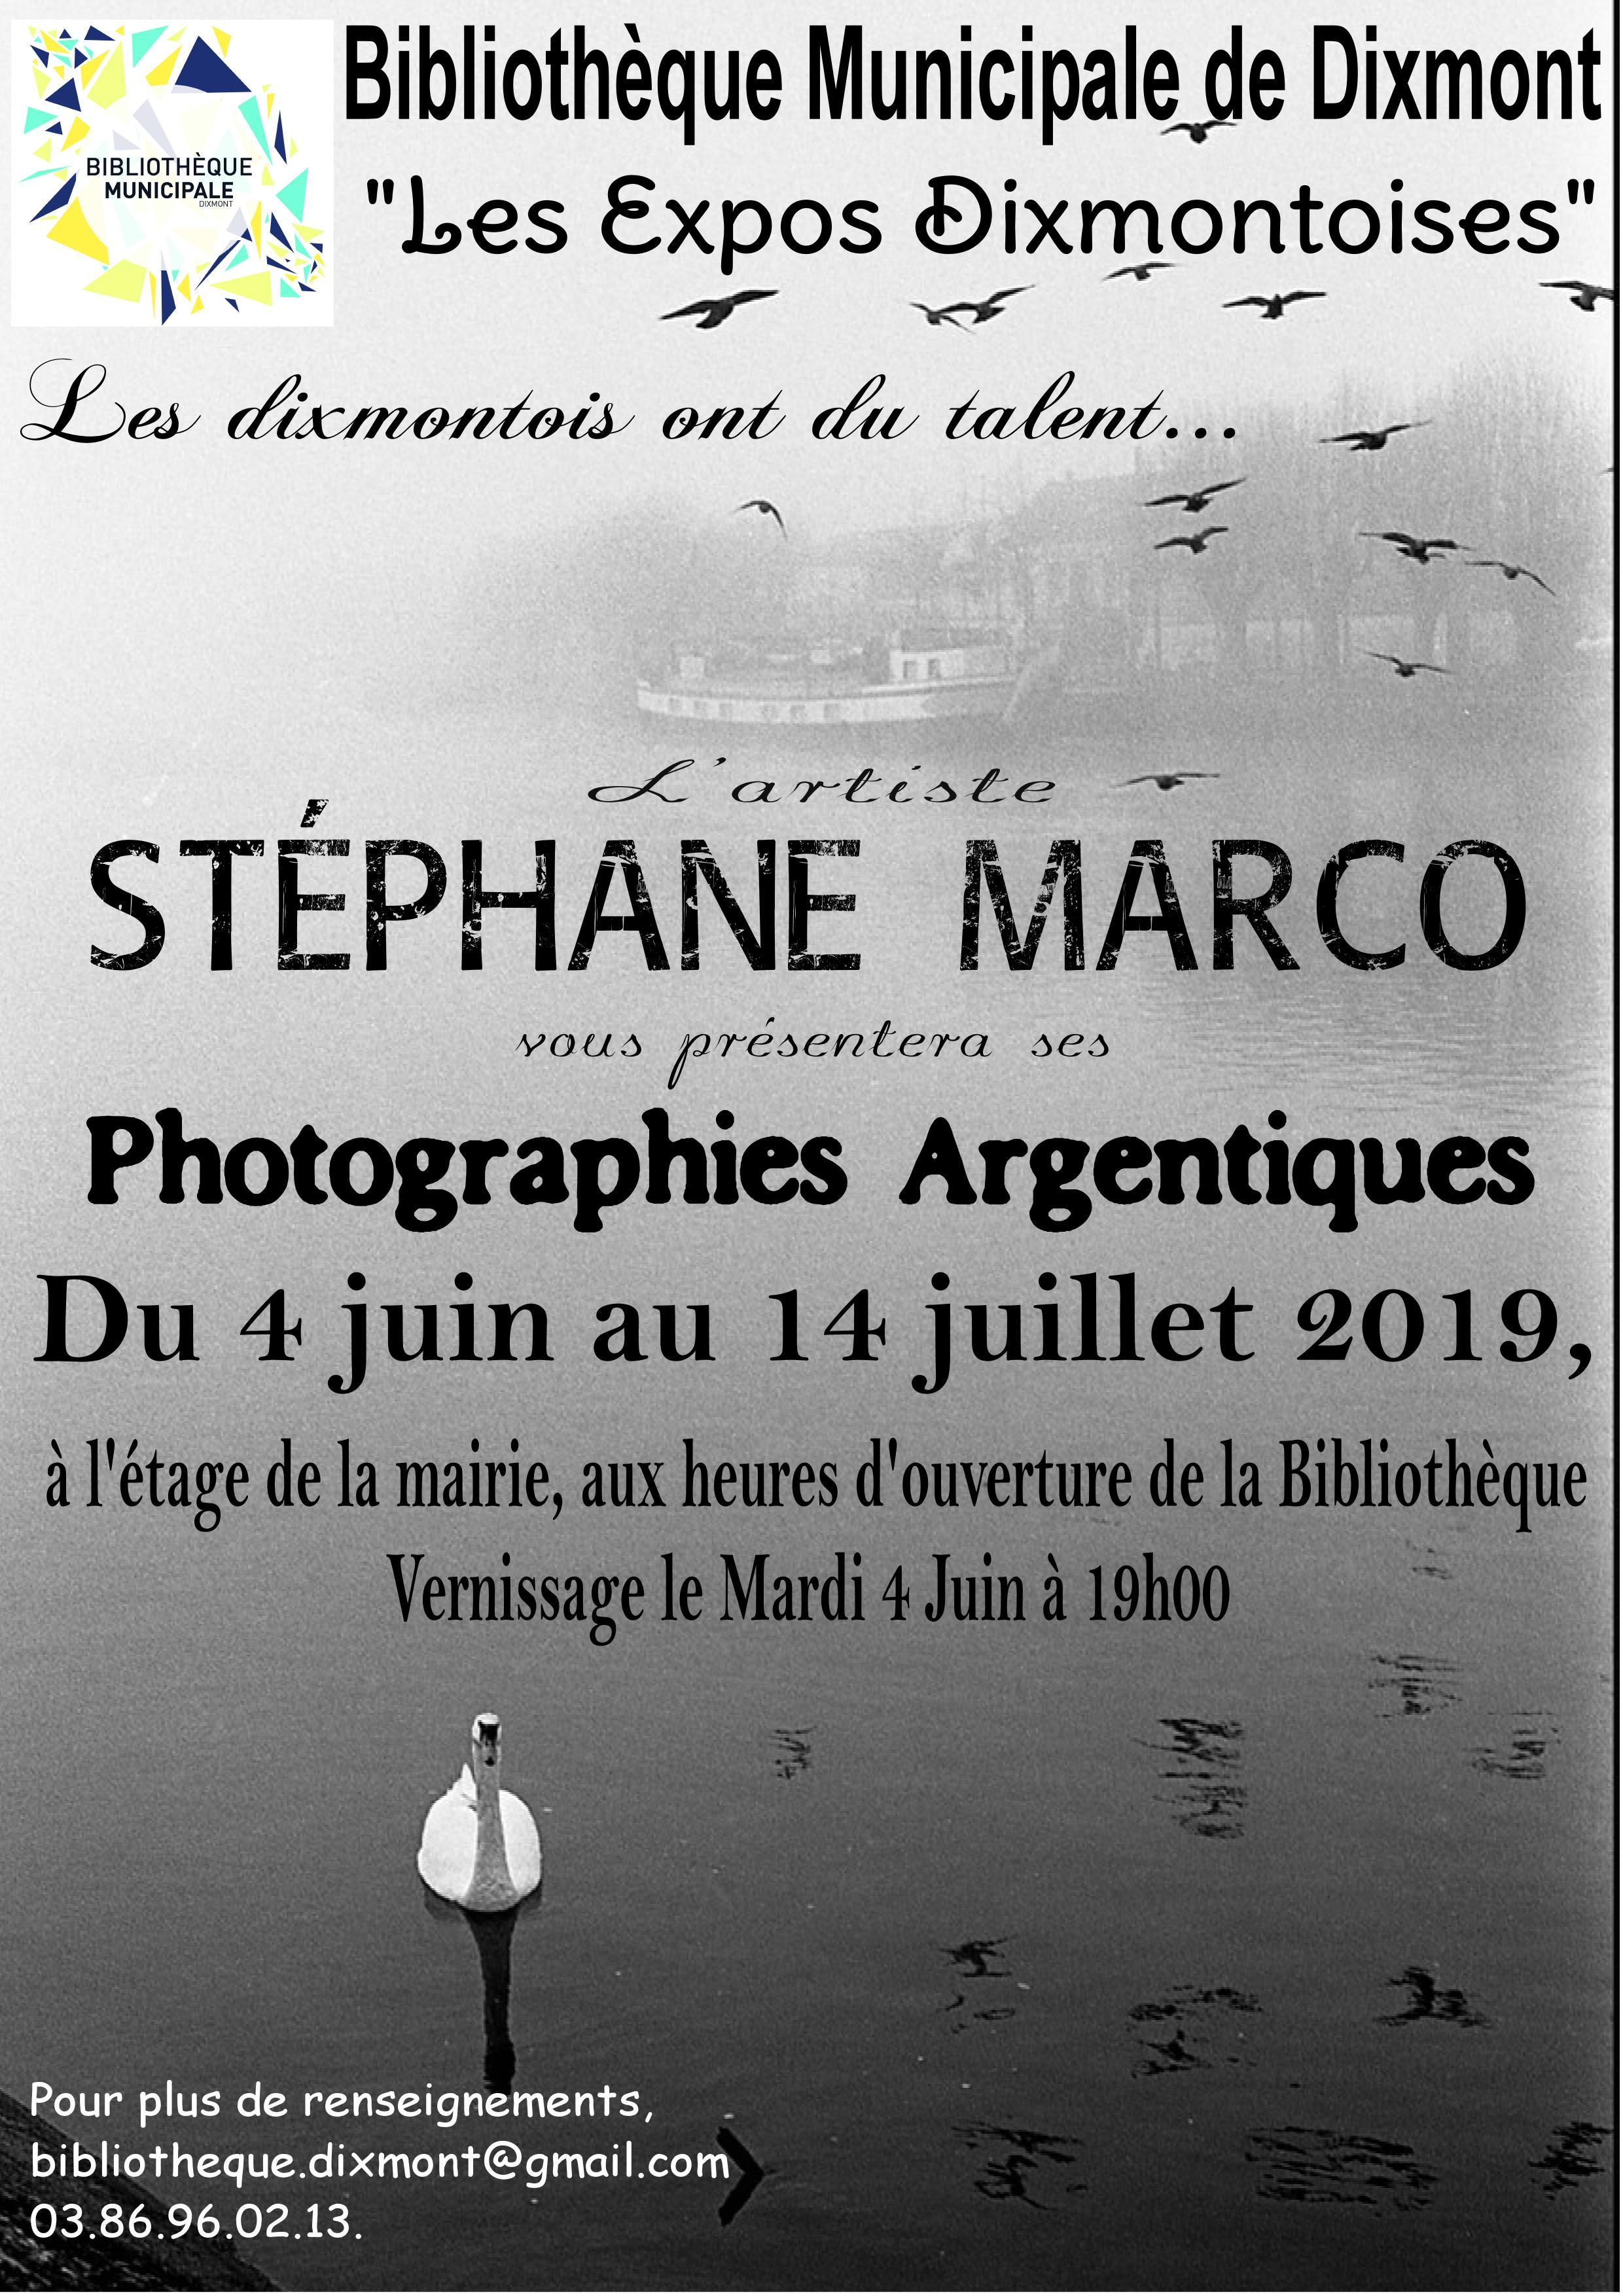 Les expos Dixmontoises - Stéphane Marco